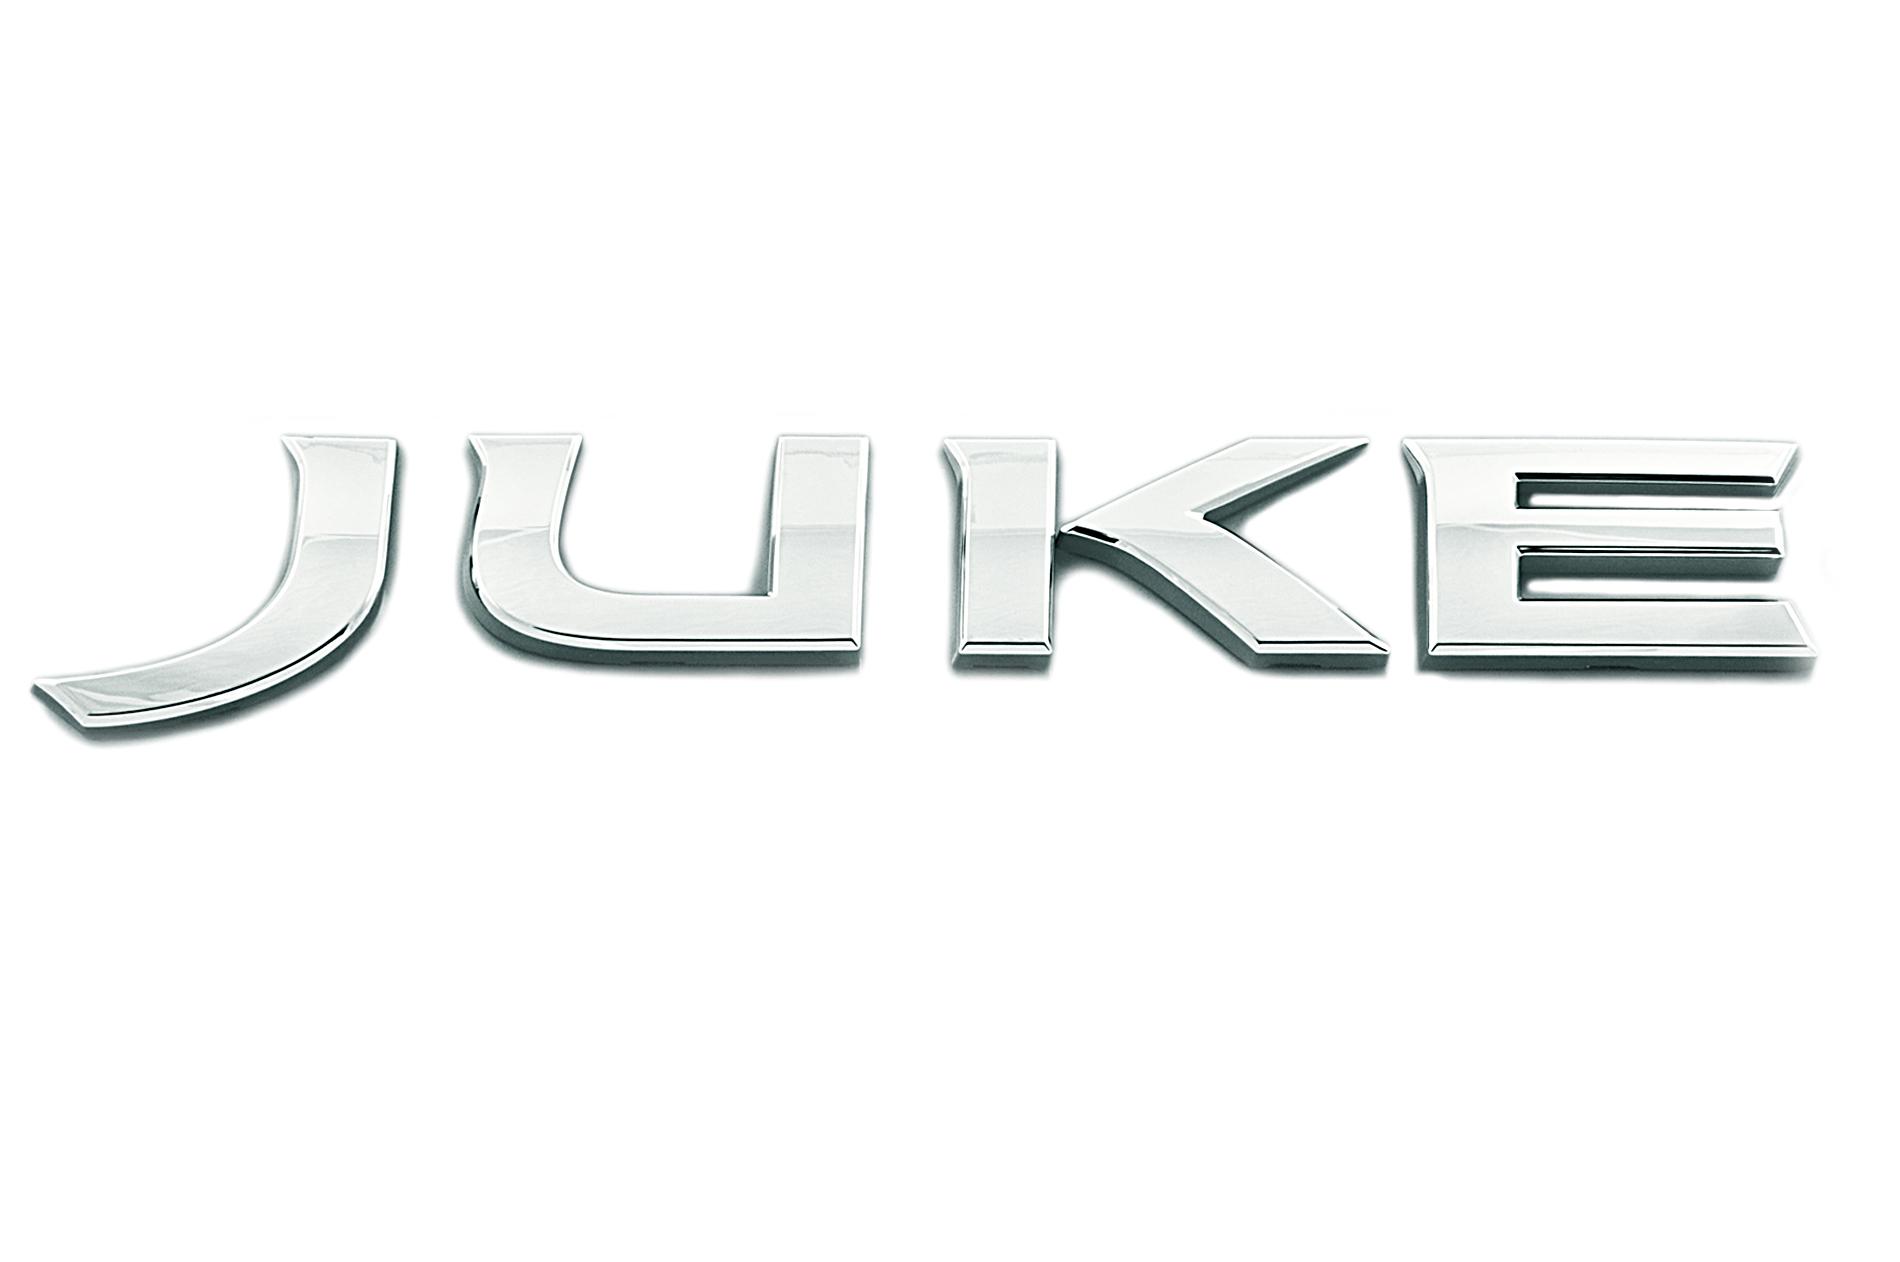 Nissan Genuine Juke Chrome Badge Emblem Rear For Boot